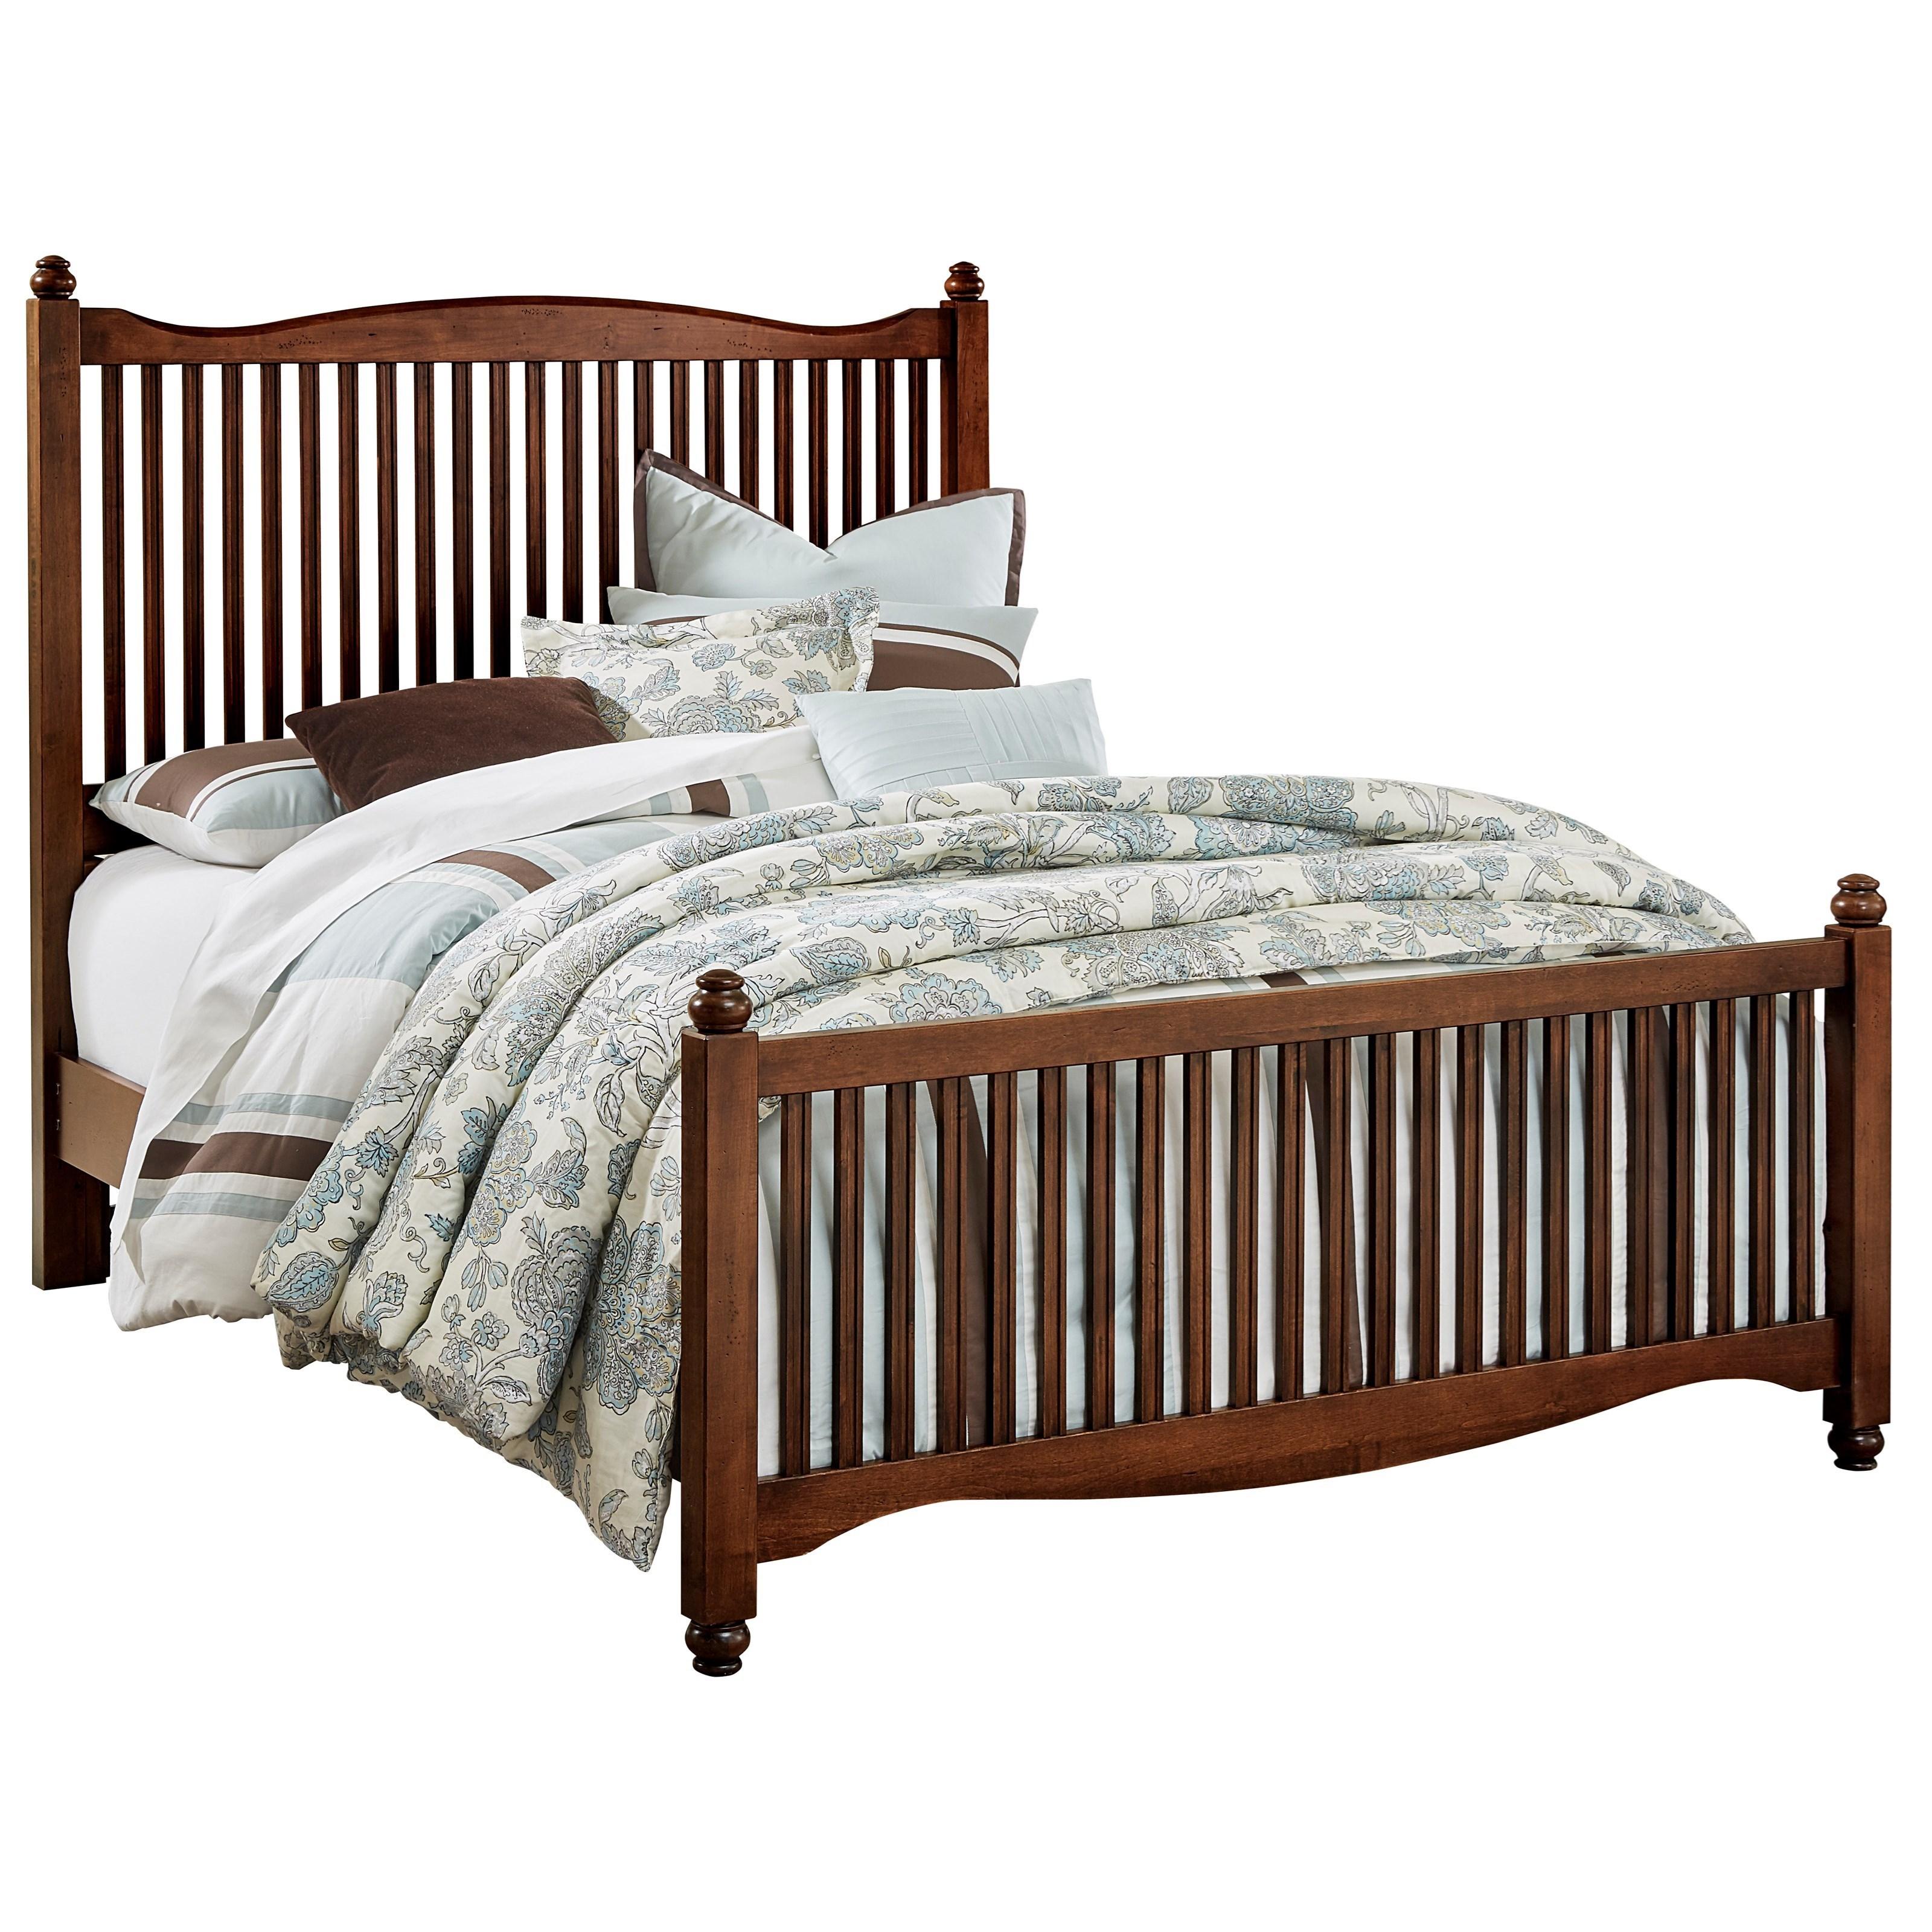 Vaughan bassett american maple solid wood queen slat bed for Panel bed mattress